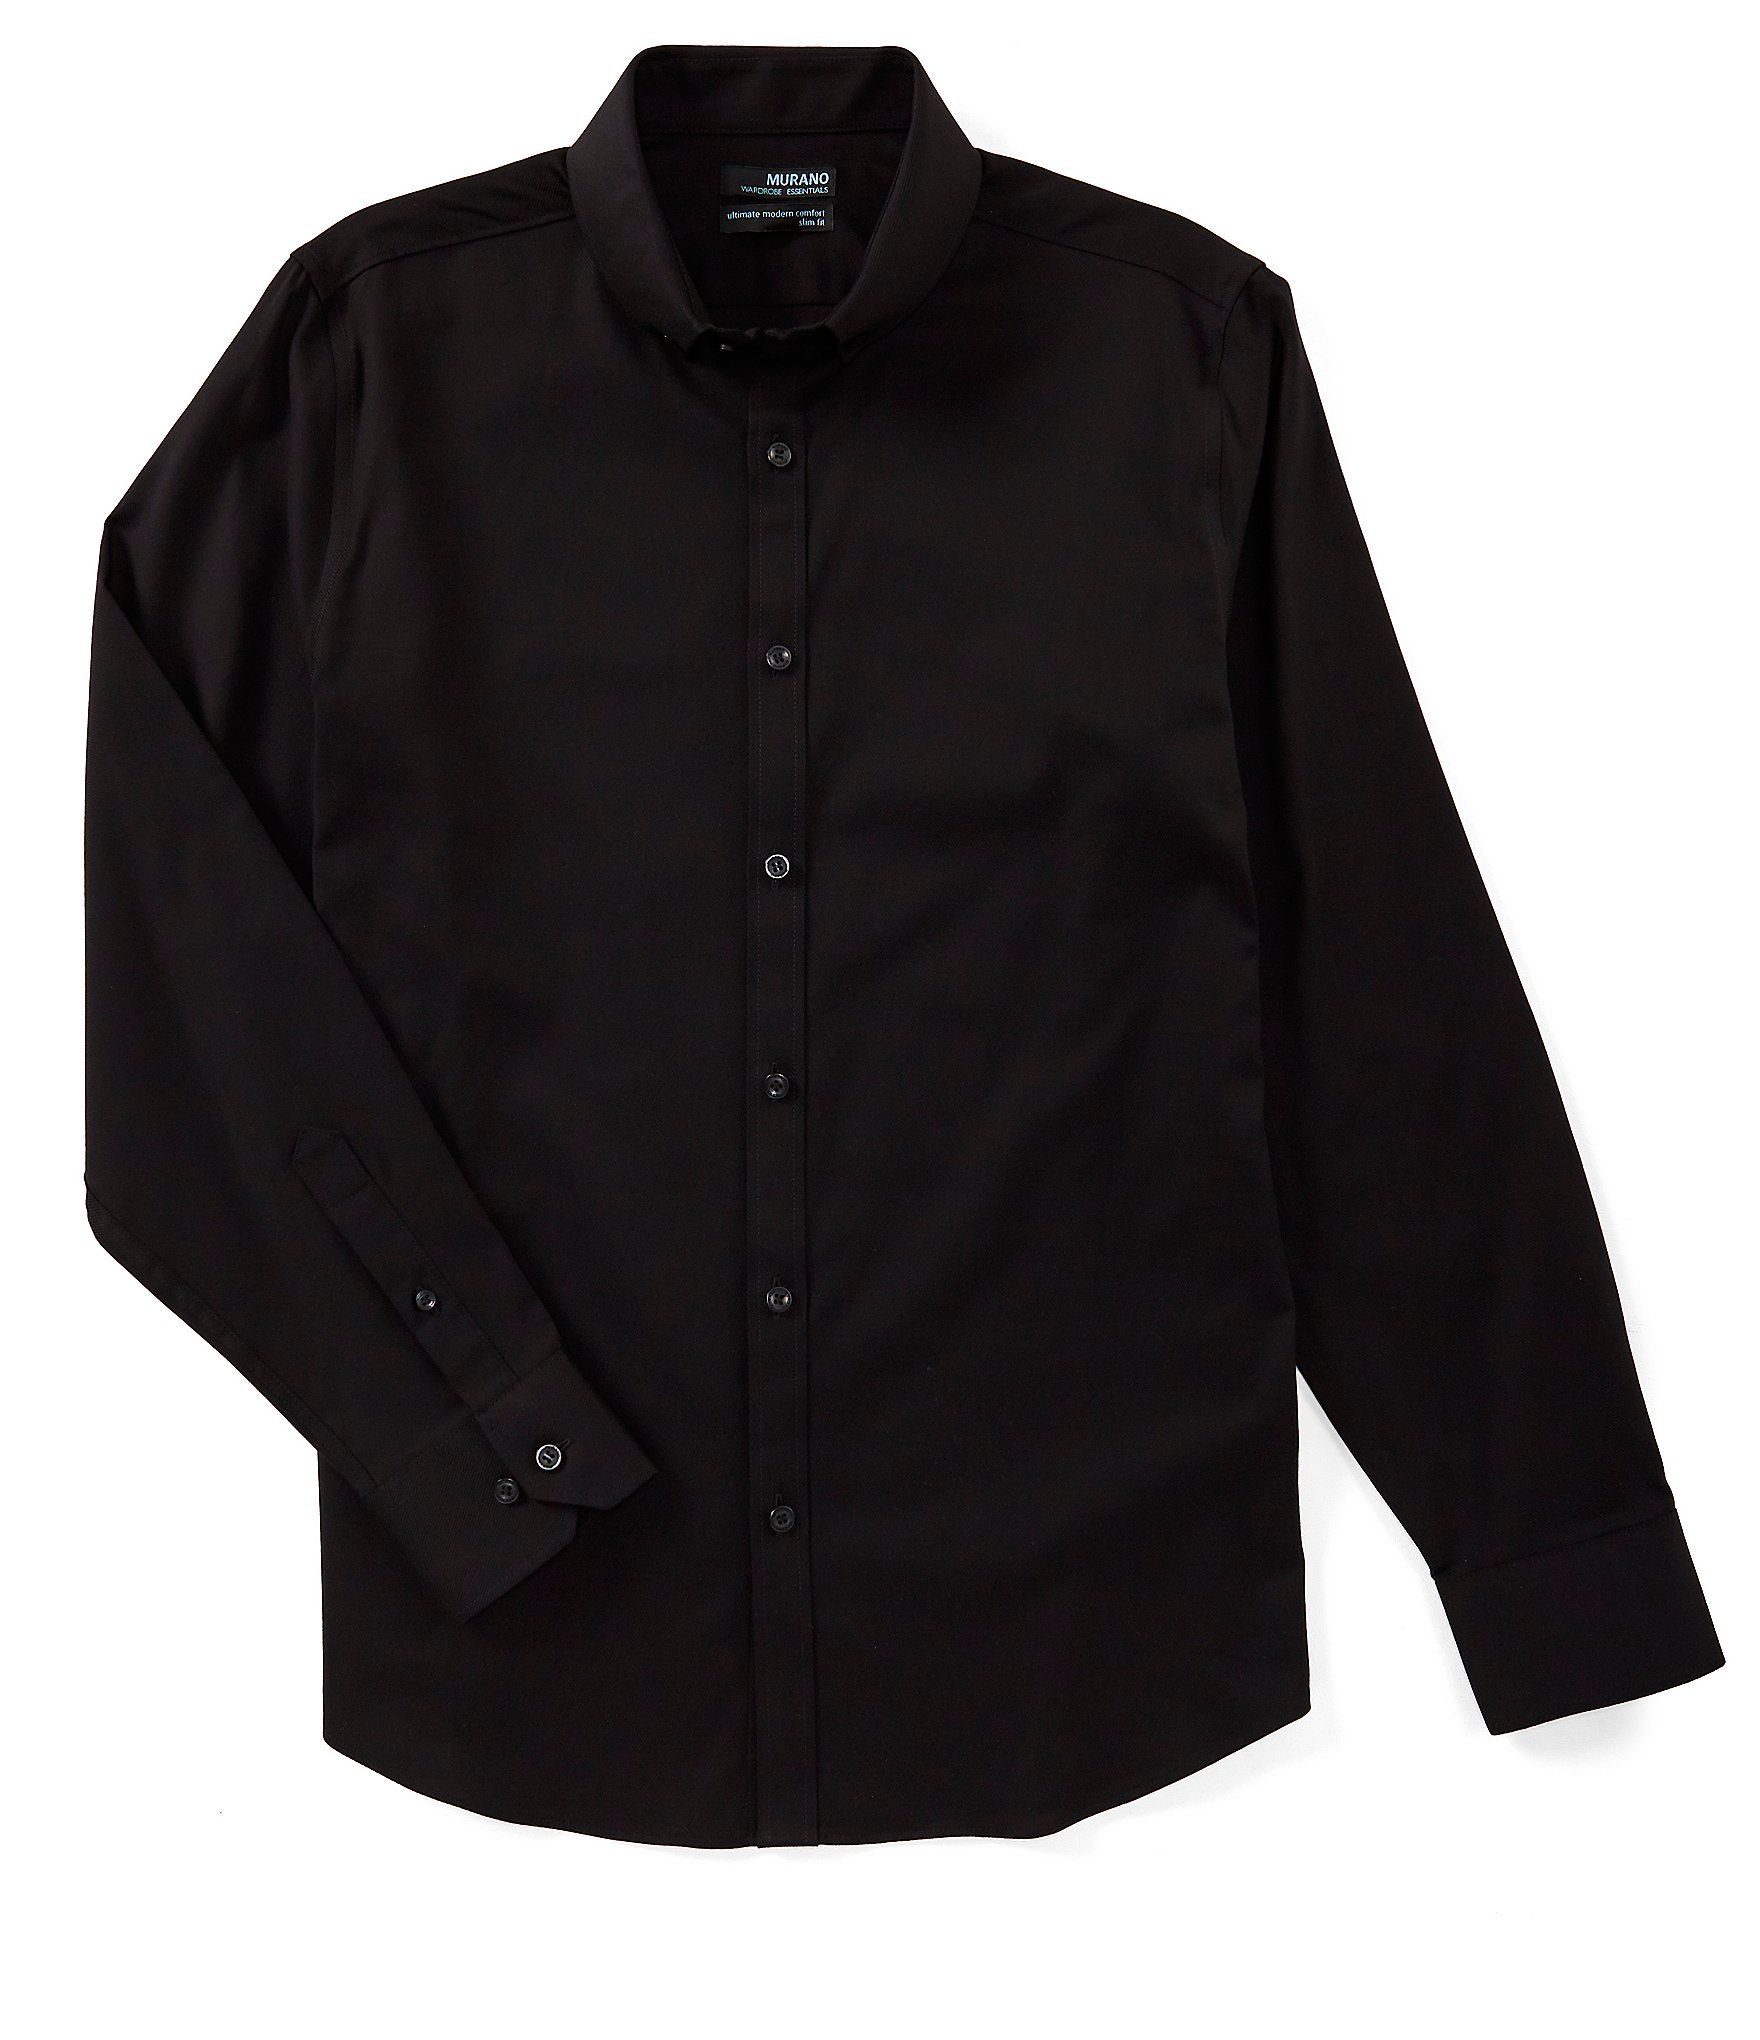 Murano Wardrobe Essentials Slim Fit Solid Twill Long Sleeve Woven Shirt Dillard S In 2021 Black Dress Shirt Men Woven Shirt Shirts [ 2040 x 1760 Pixel ]